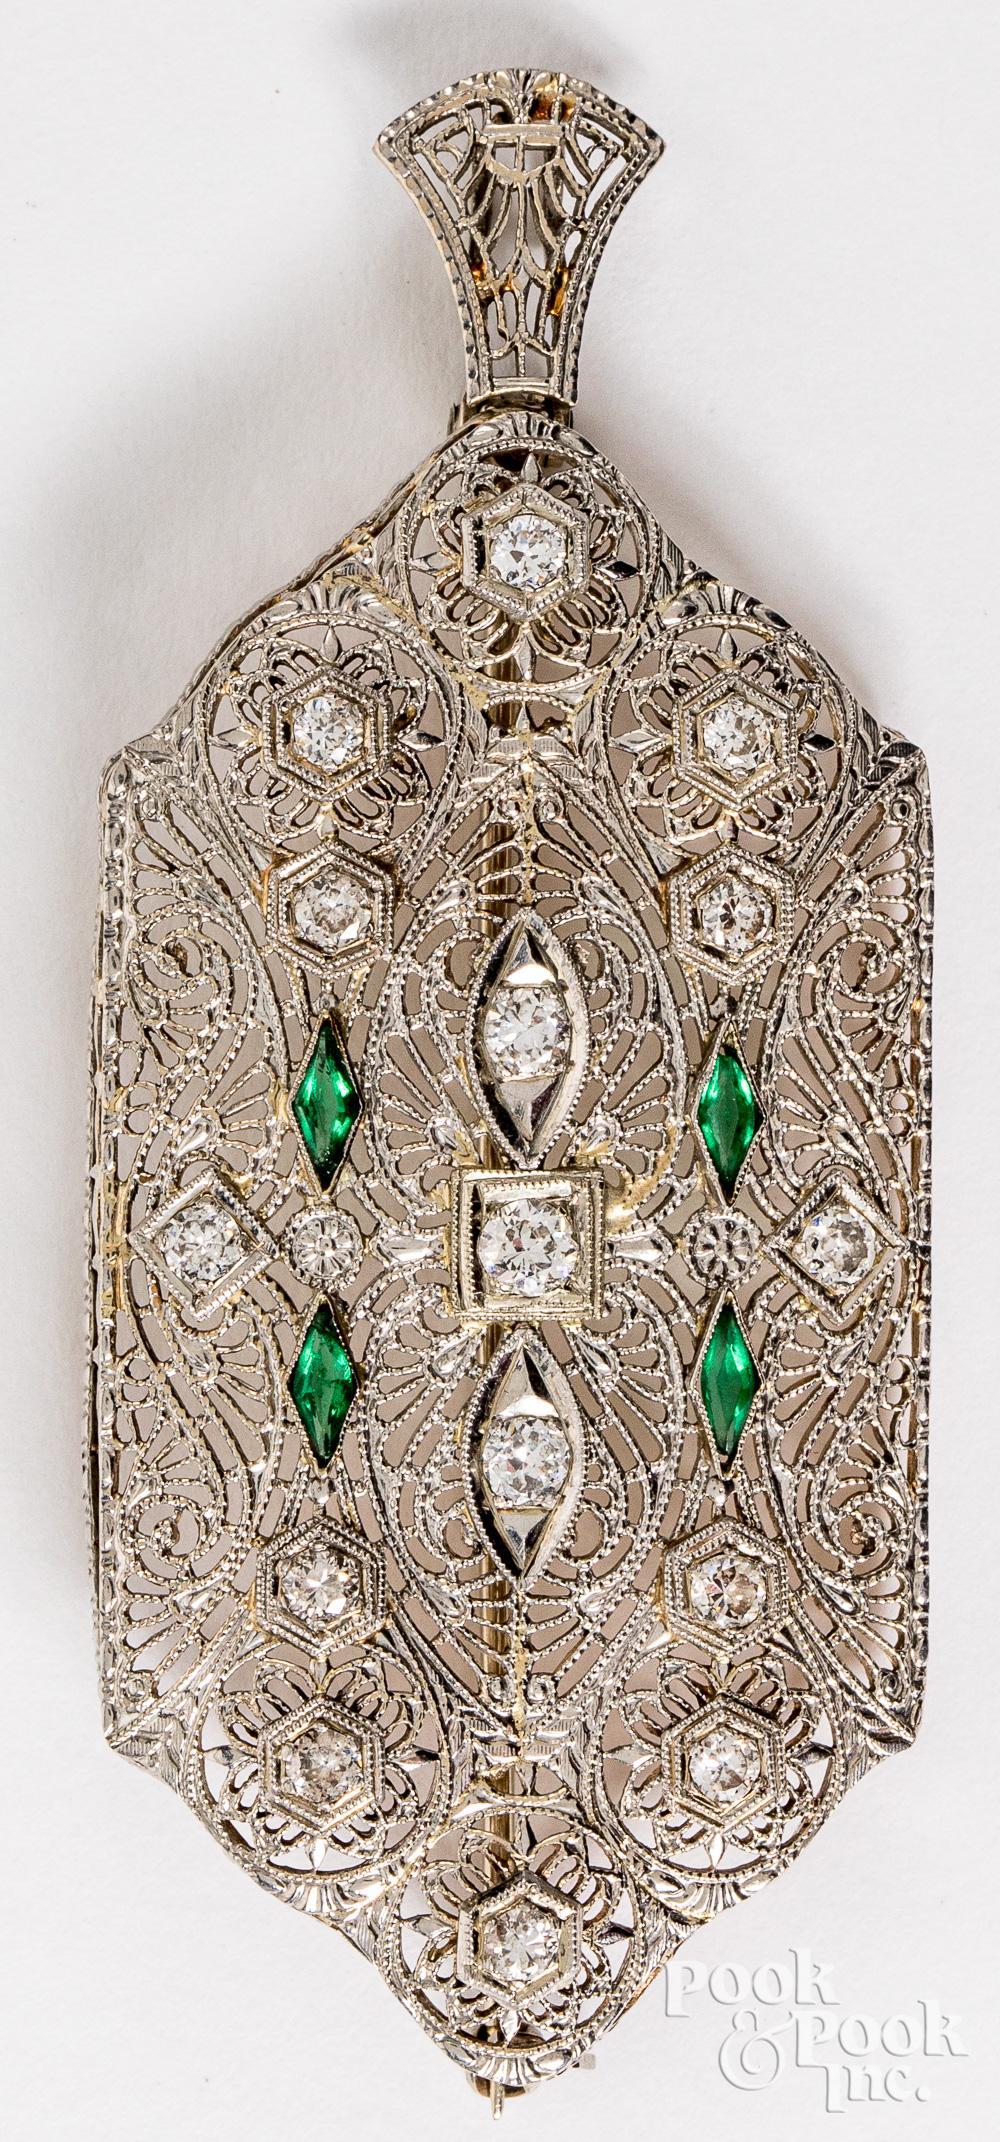 14K gold, diamond, and emerald pendant pin, 5 dwt.